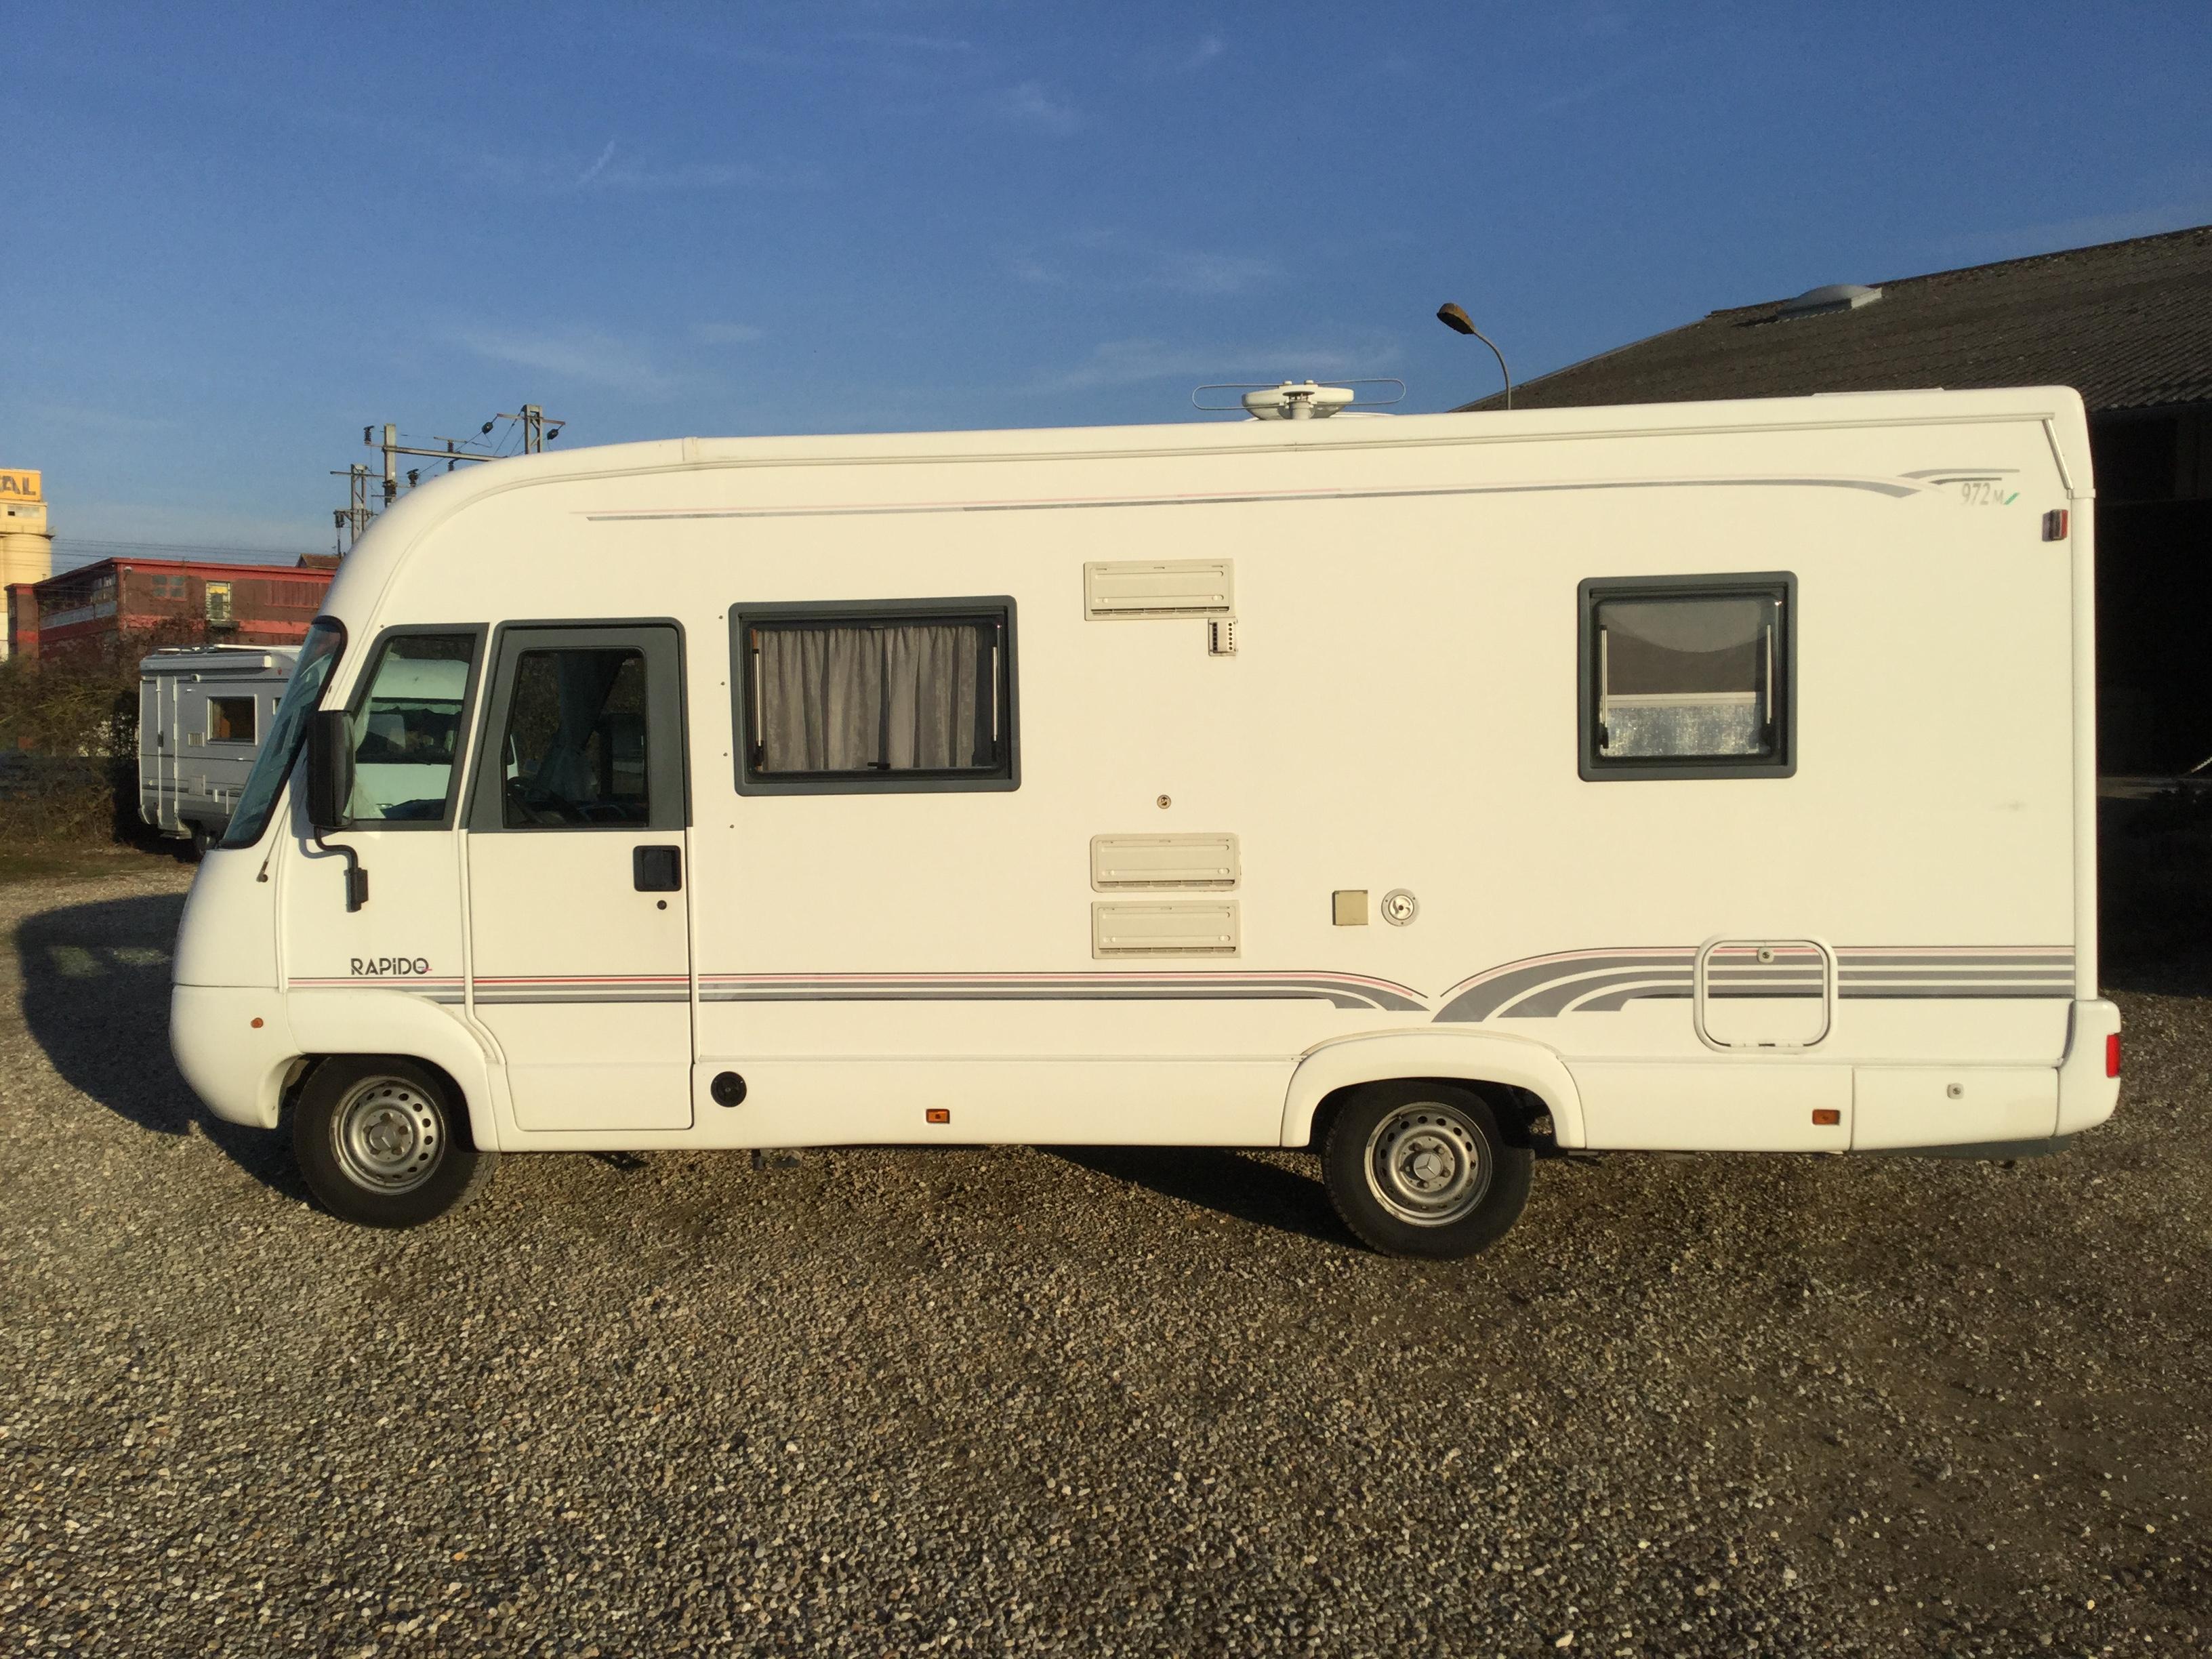 rapido 972 m occasion porteur mercedes 313 cdi camping car vendre en eure 27 ref 77097. Black Bedroom Furniture Sets. Home Design Ideas